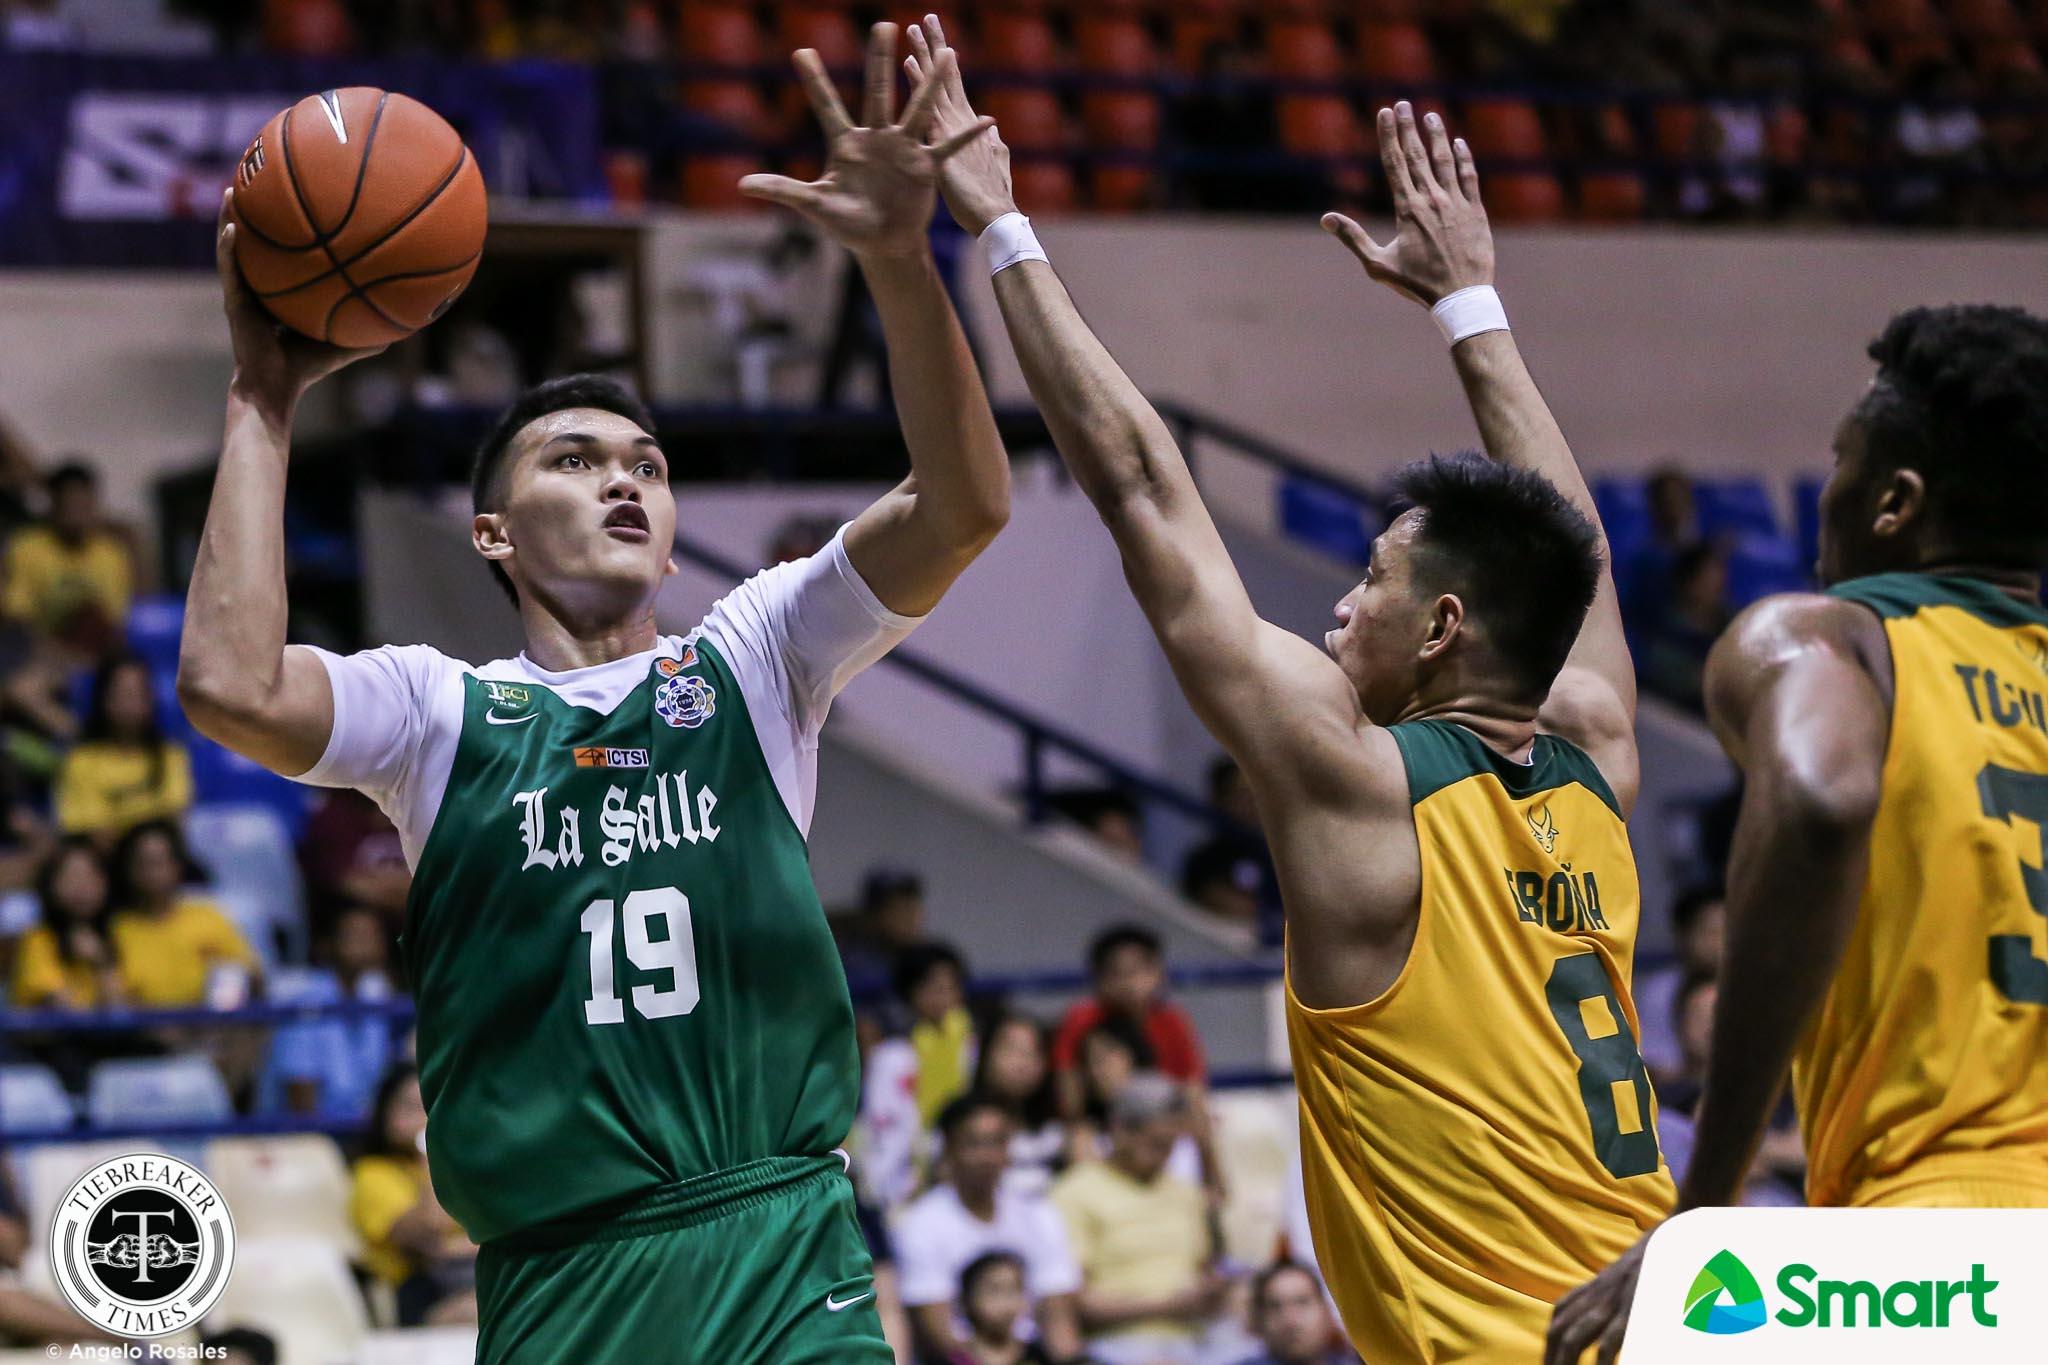 UAAP-82-MBT-FEU-VS-DLSU-BALTAZAR Justine Baltazar in Pampanga Delta lineup Basketball DLSU NBL News UAAP  - philippine sports news